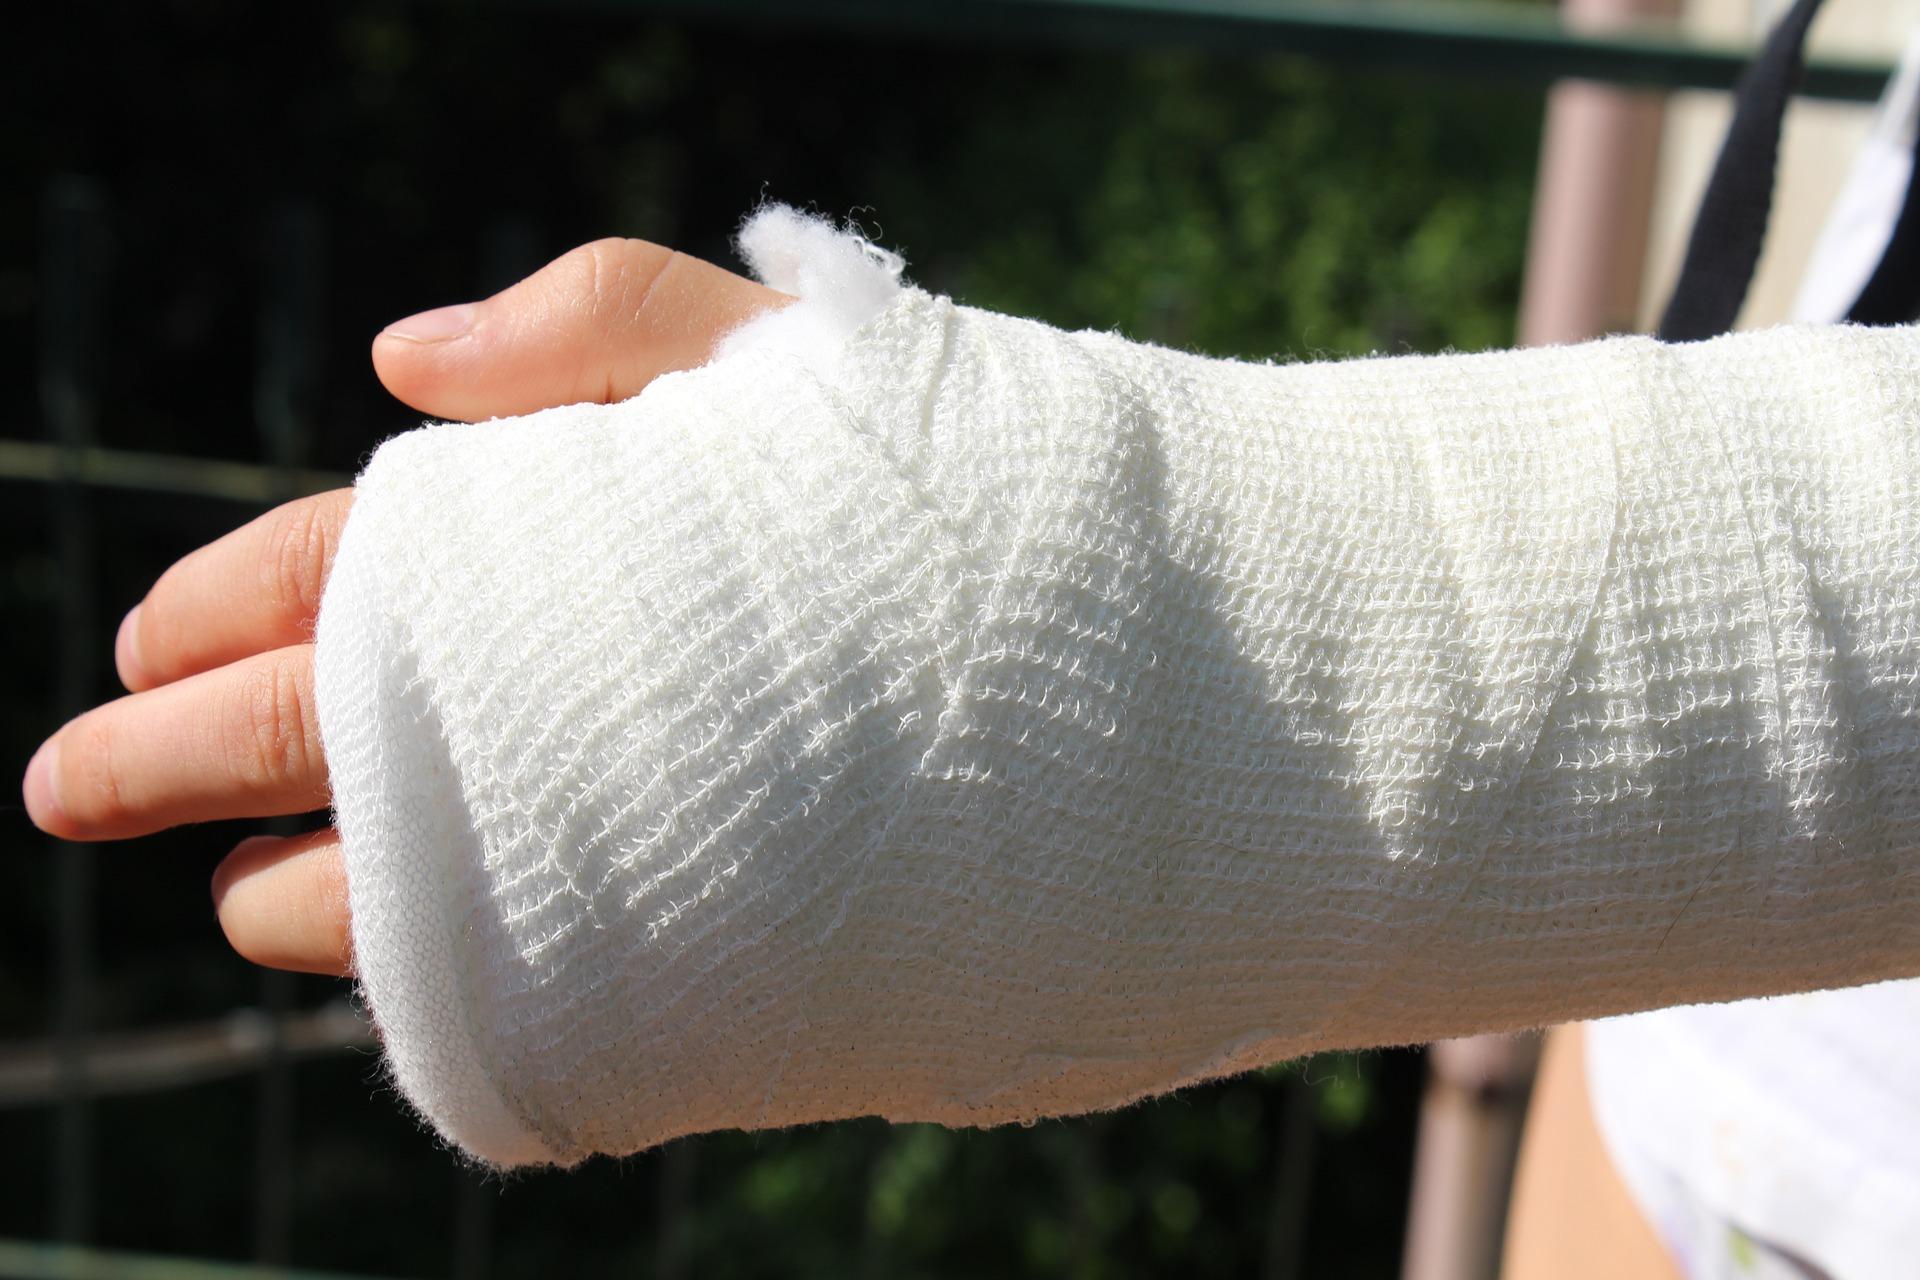 Lesion mano